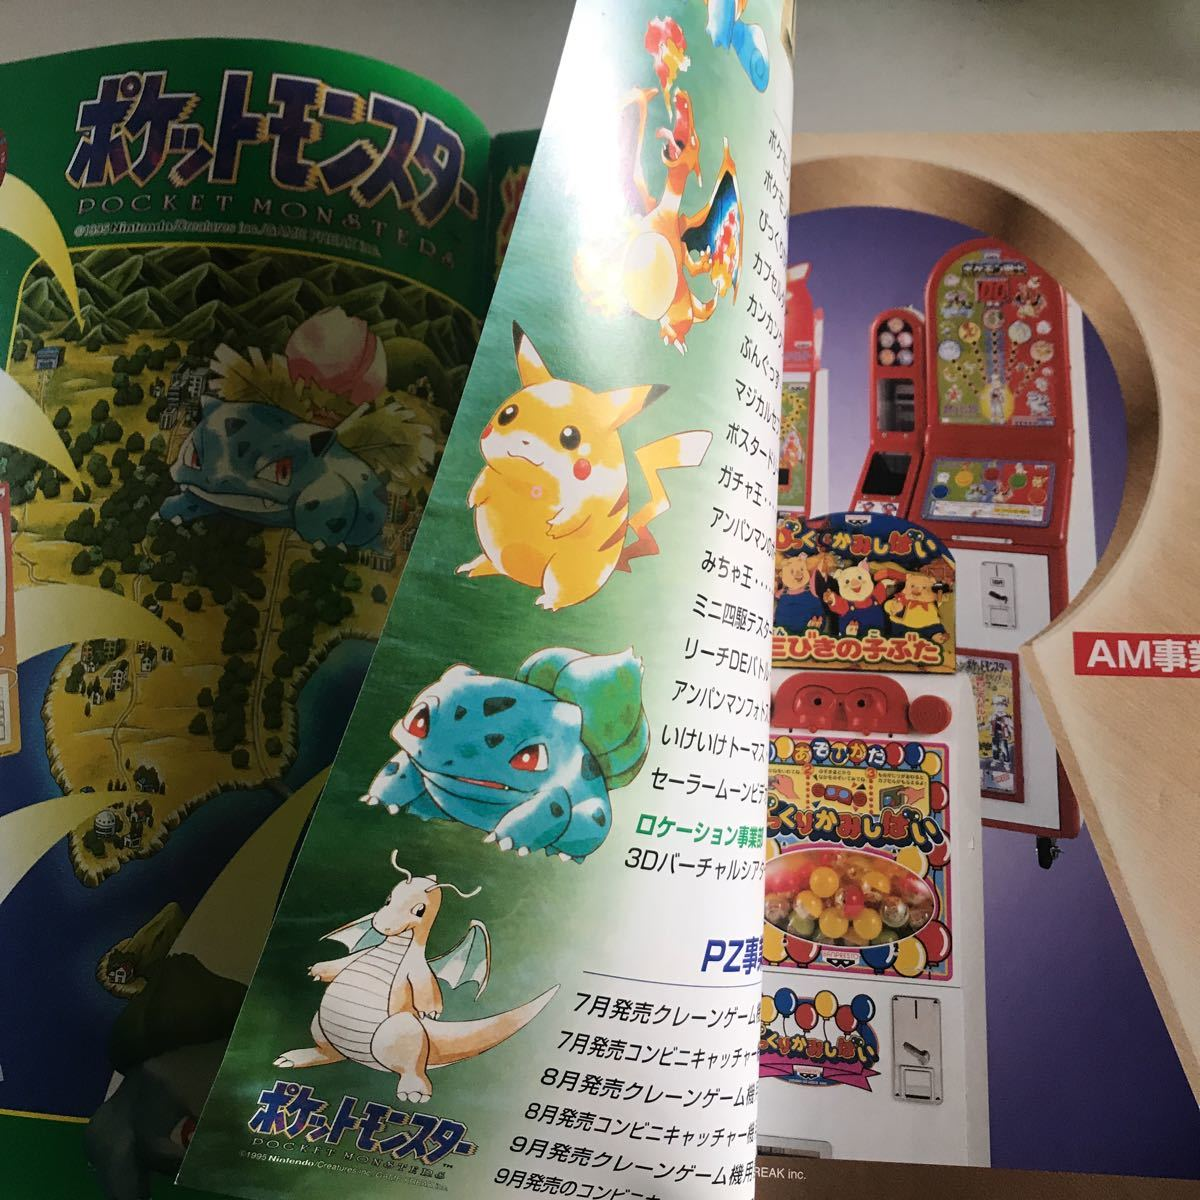 No.457 アーケードゲーム BANPRESTO プライズ 業務用 非売品 カタログ バンプレスト 景品 カタログ_画像2